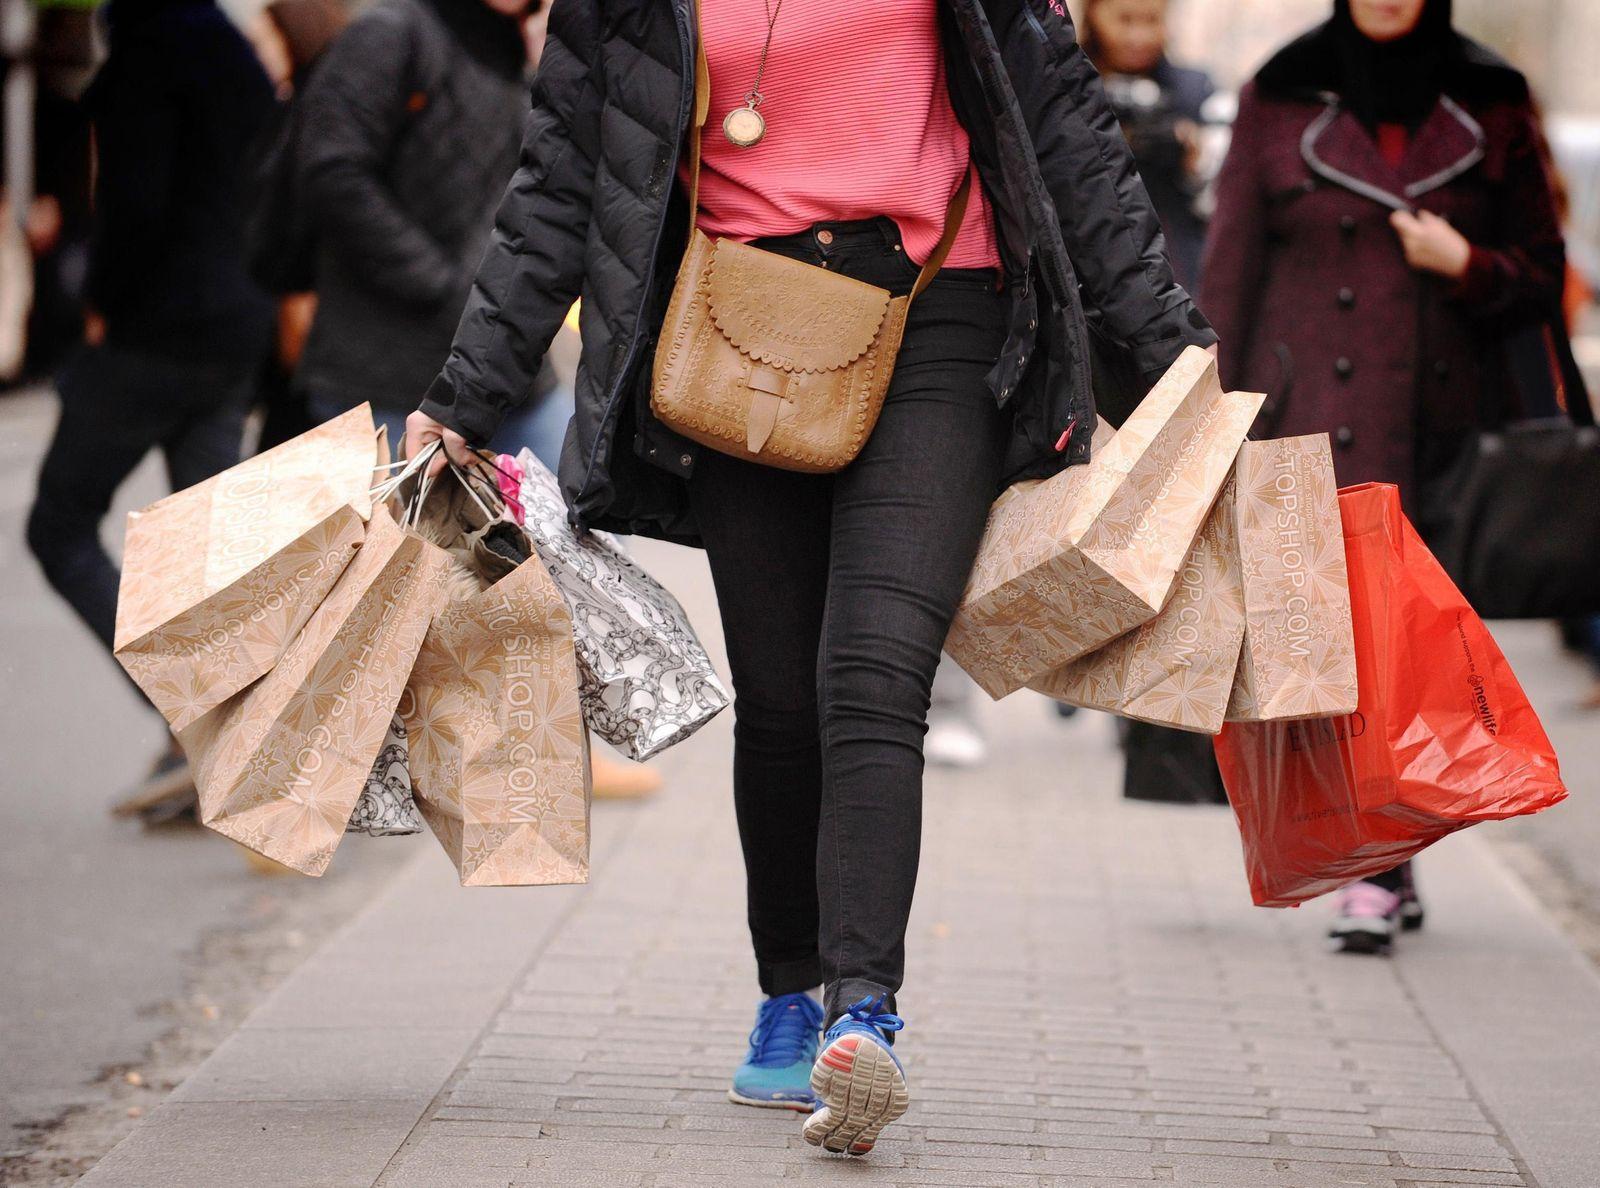 Einzelhandel - Schottland